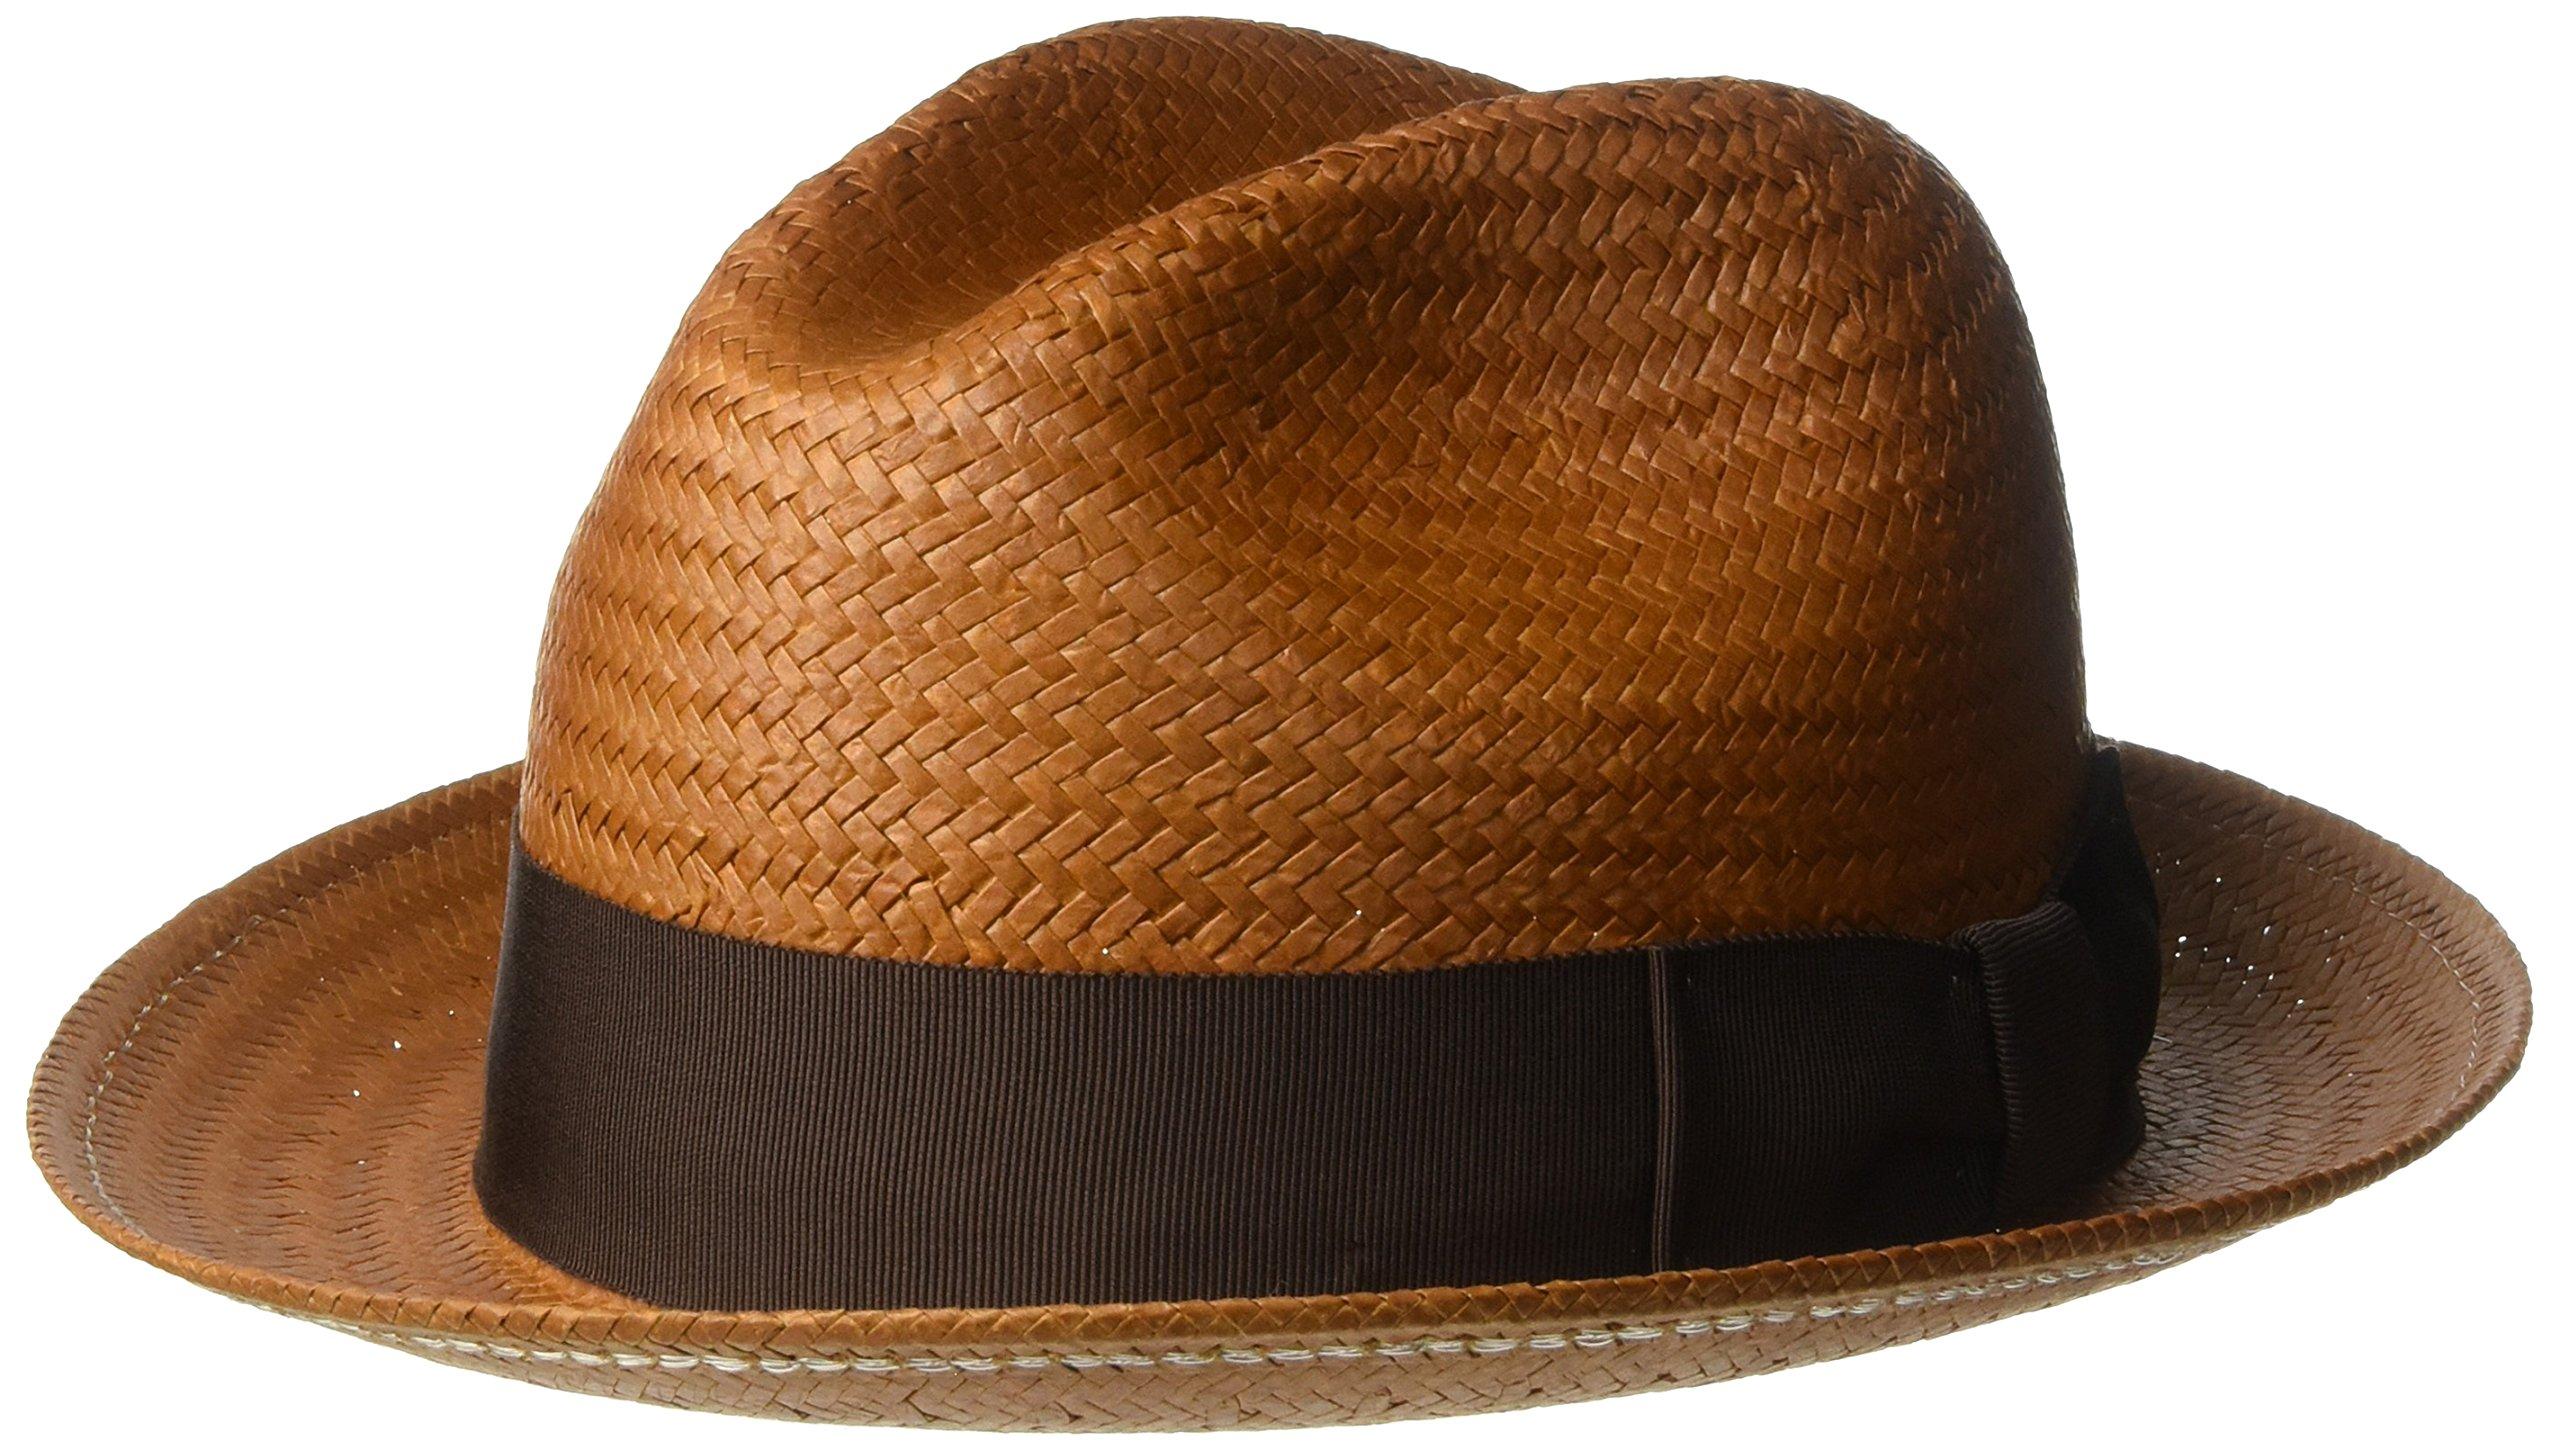 Bailey of Hollywood Men's Lando Fedora Trilby Hat, Cinnamon, L